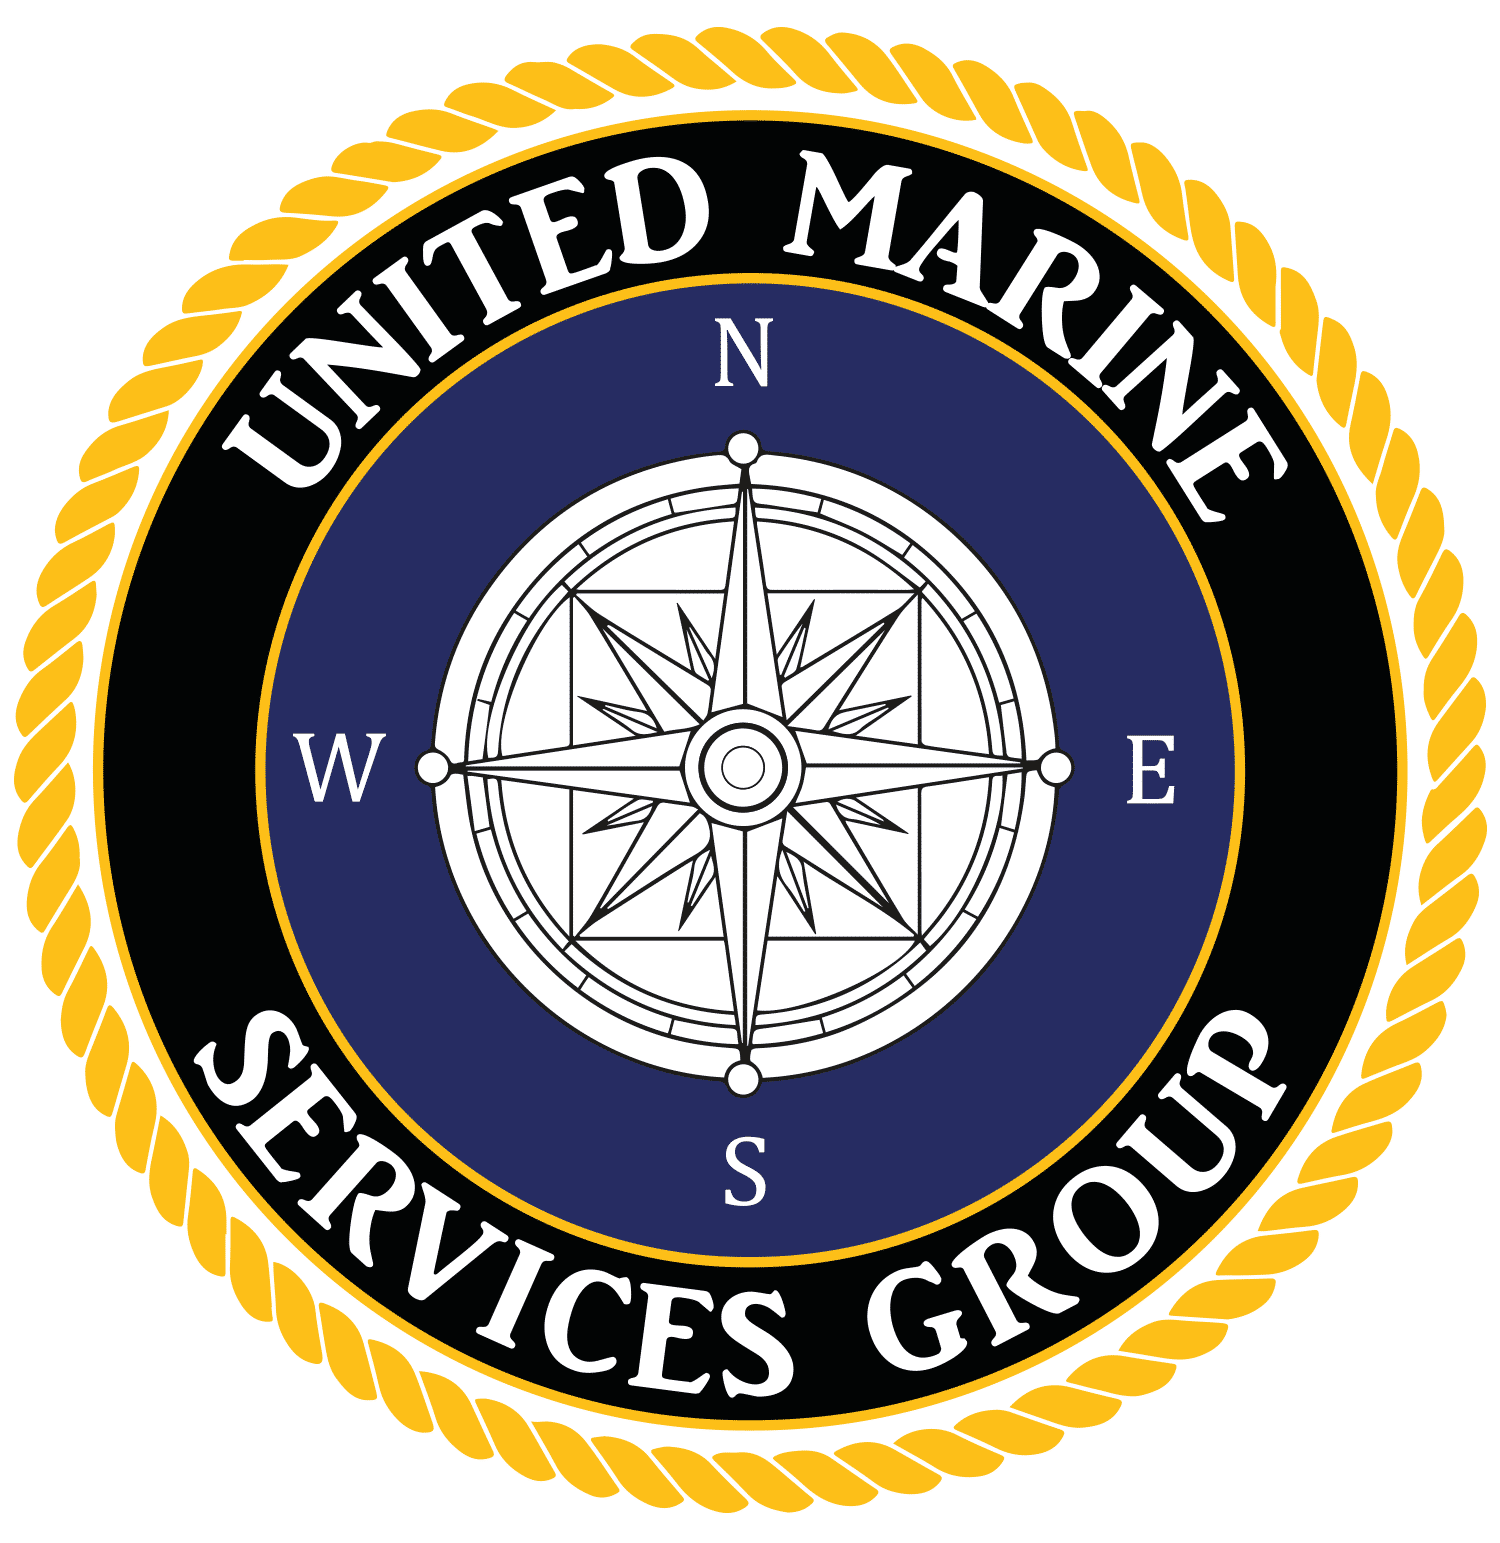 UMSG Group